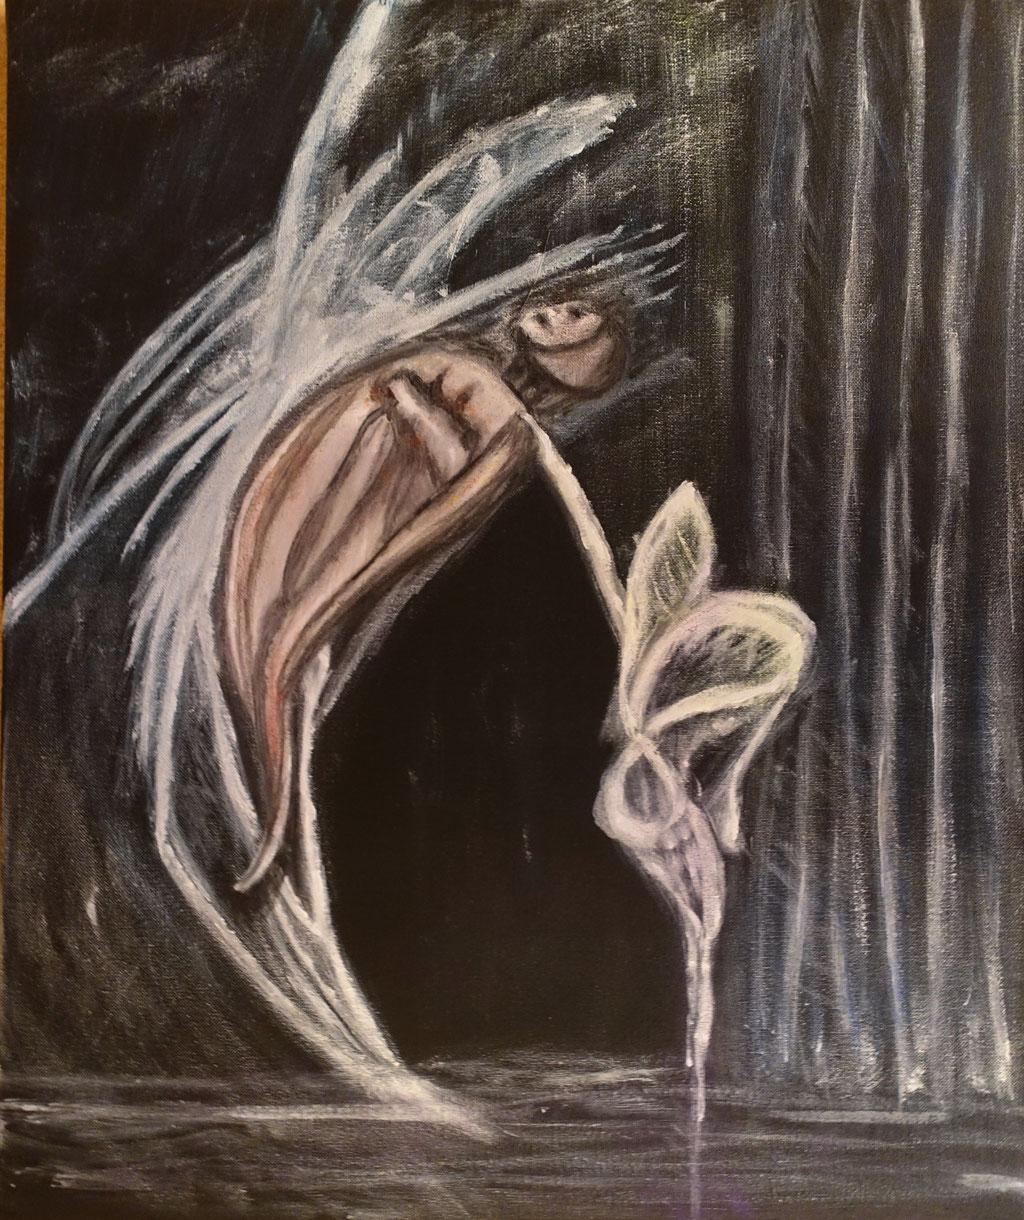 """Traumtänzerin"", Acryl auf Leinwand, 60x50 cm"